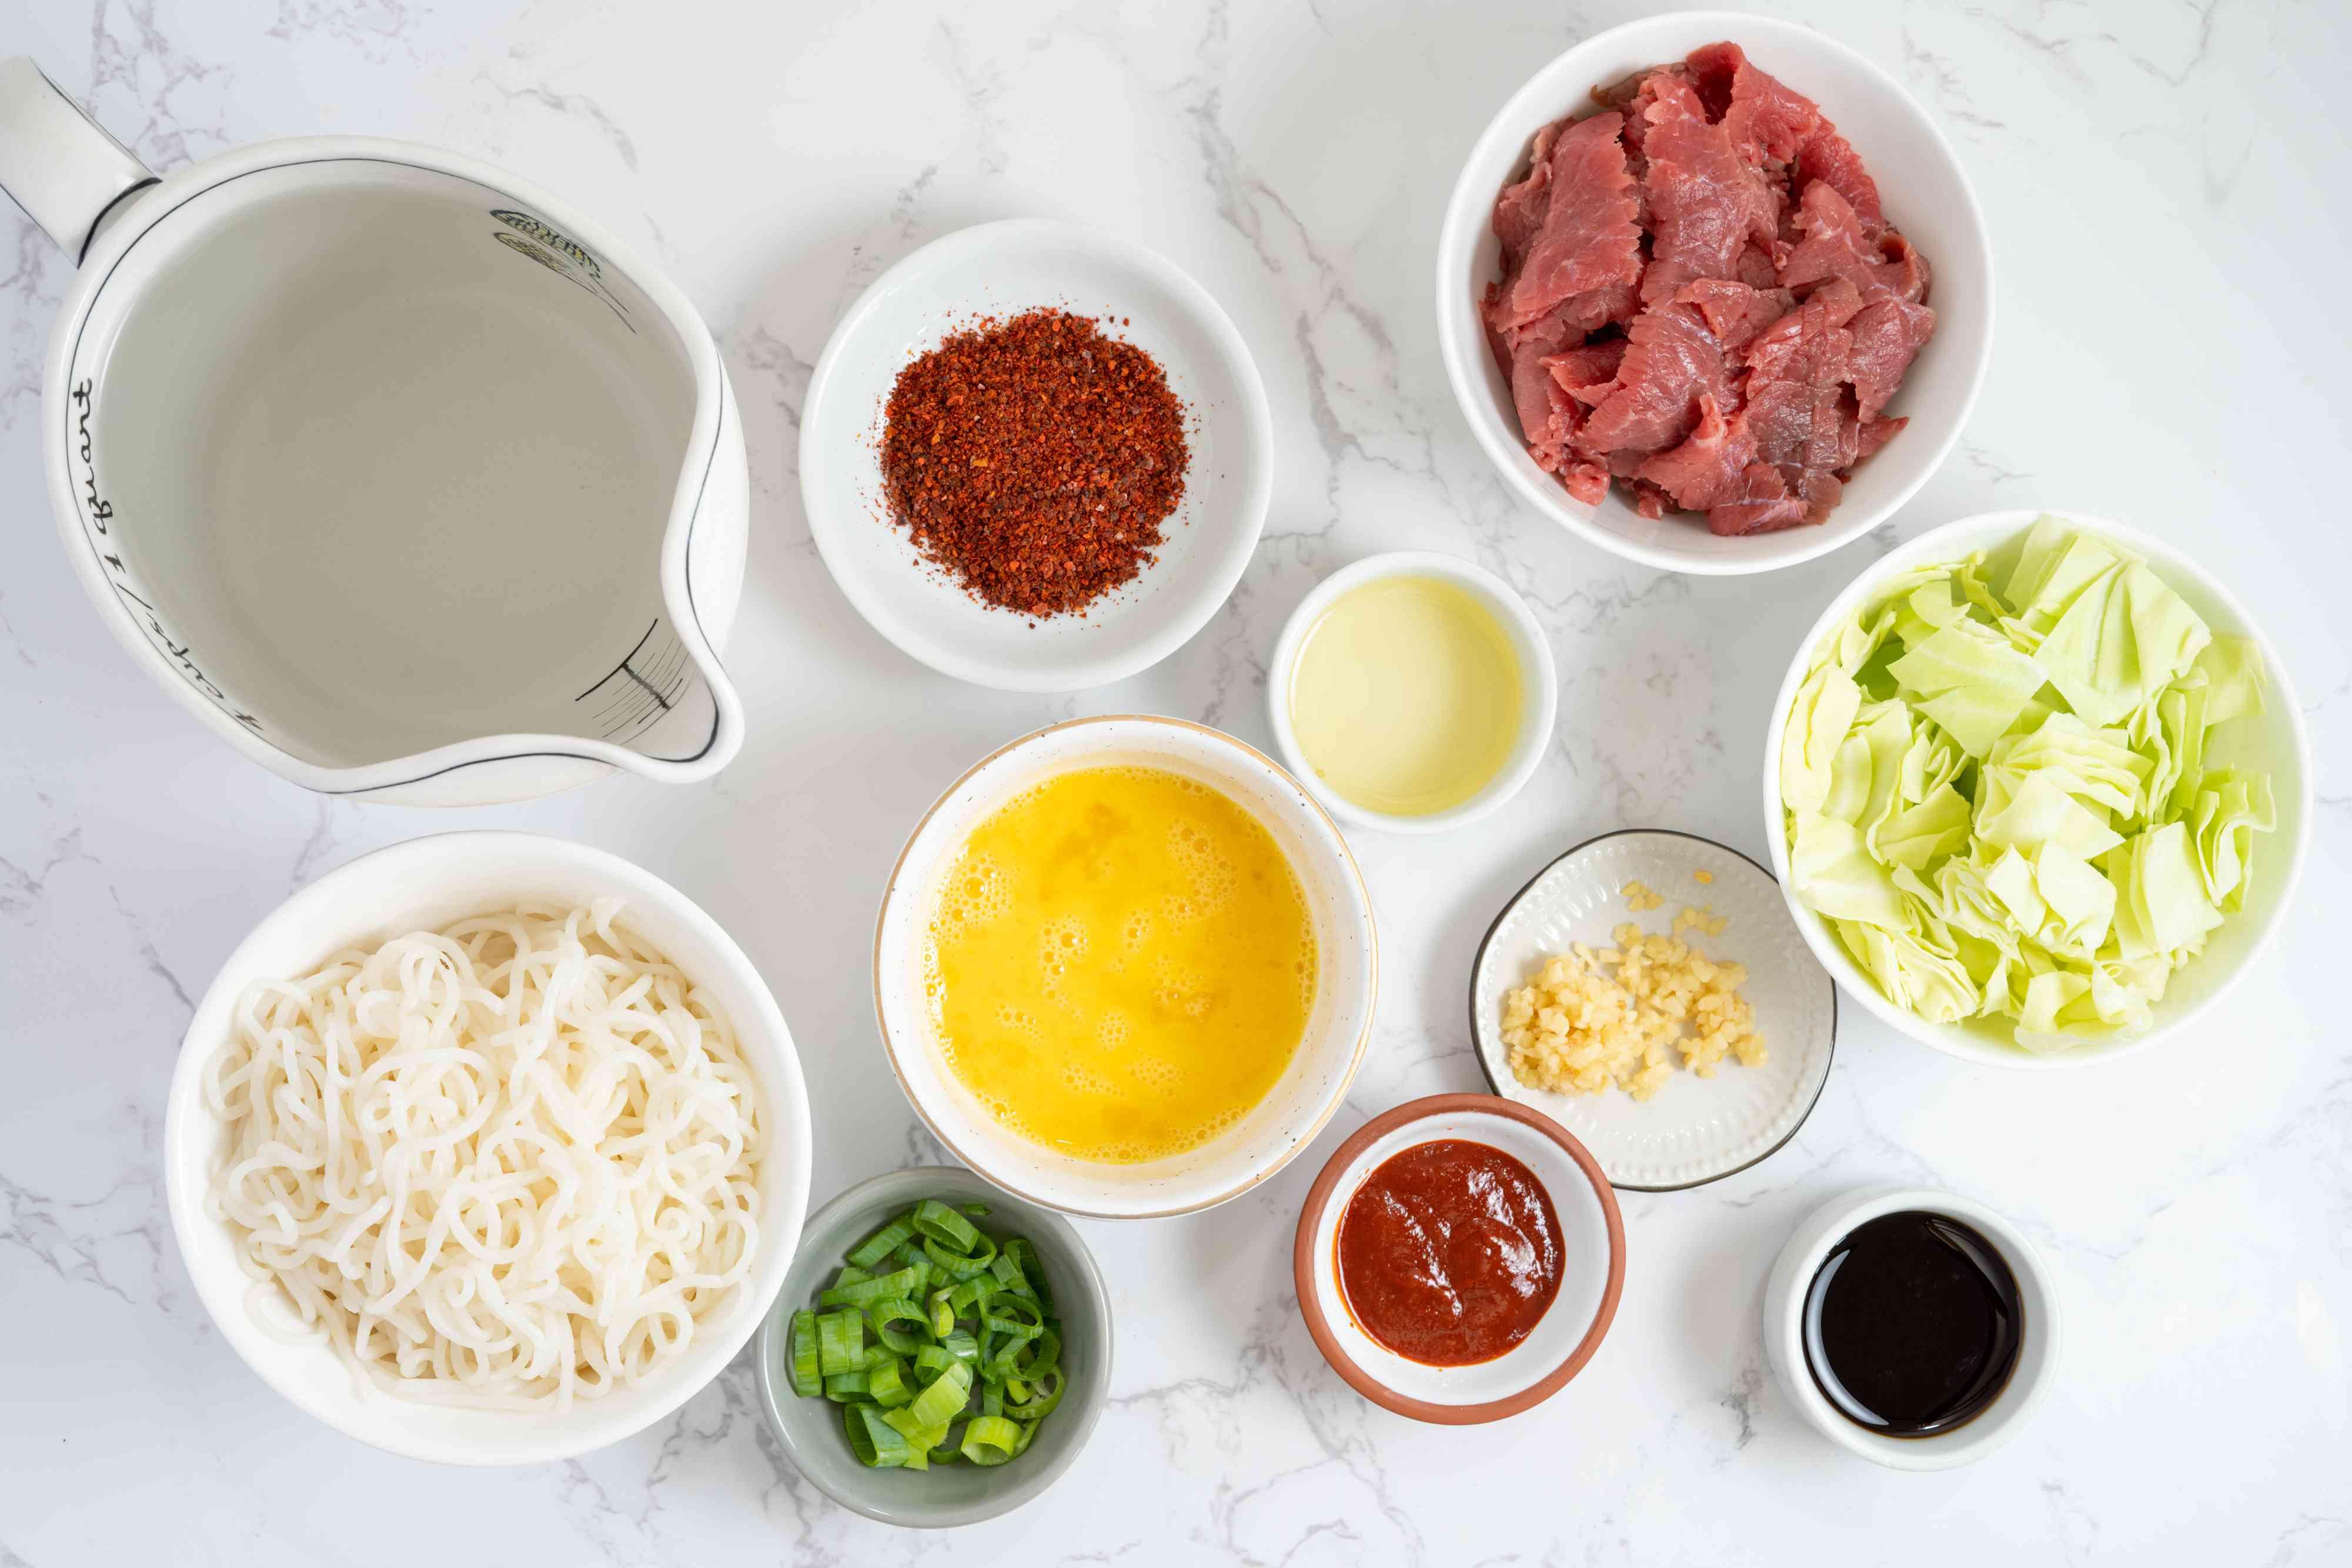 Korean Spicy Noodle Soup Recipe ingredients